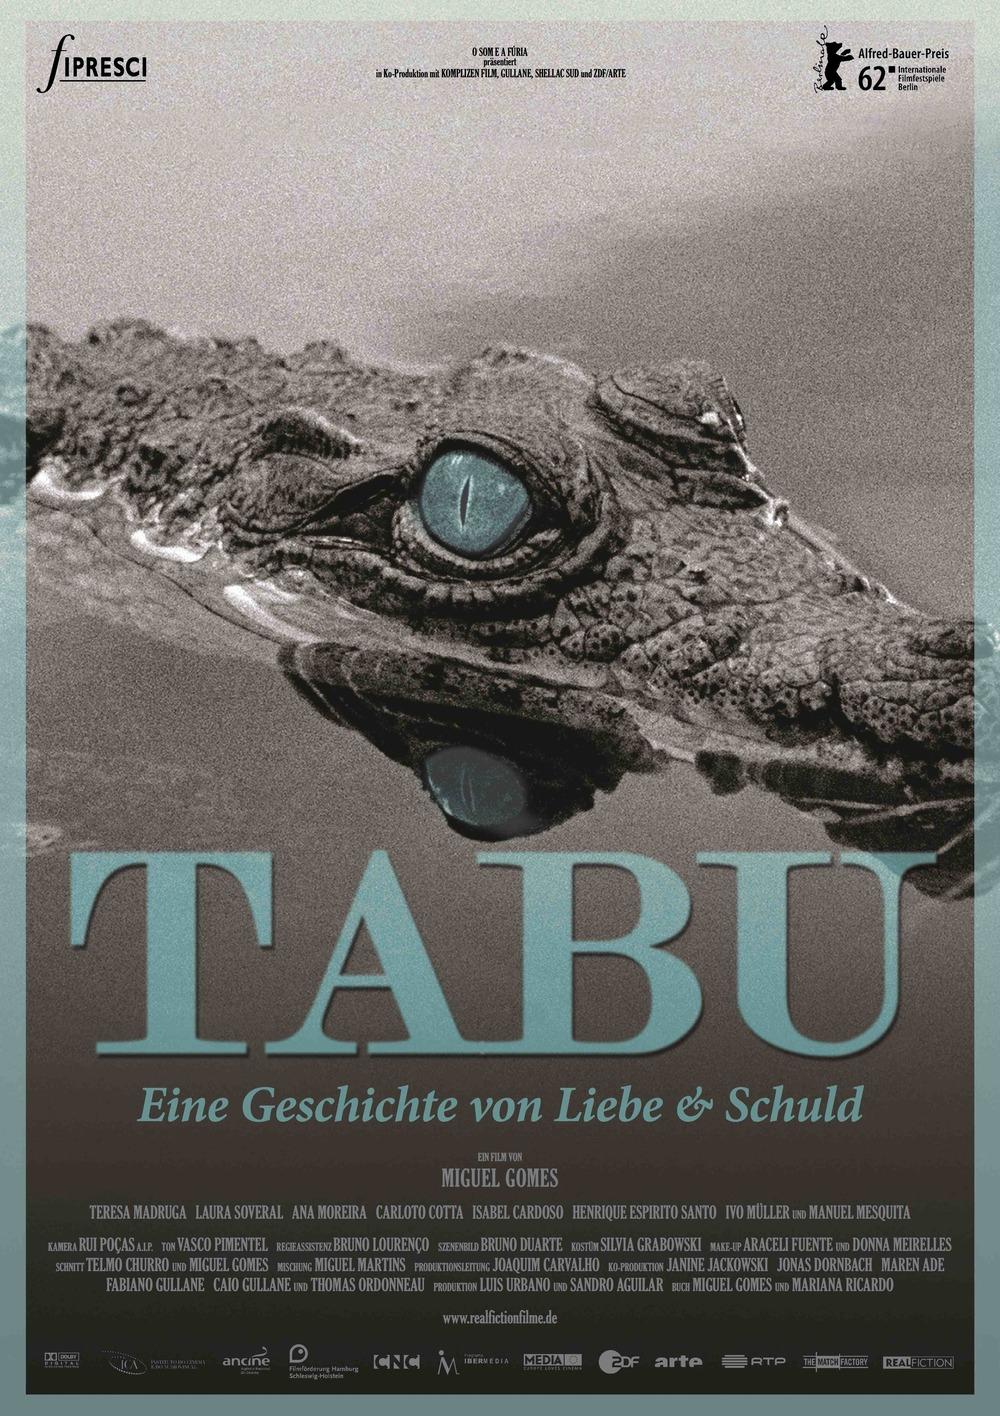 Komplizen_Tabu_A1_Krokodil.jpg